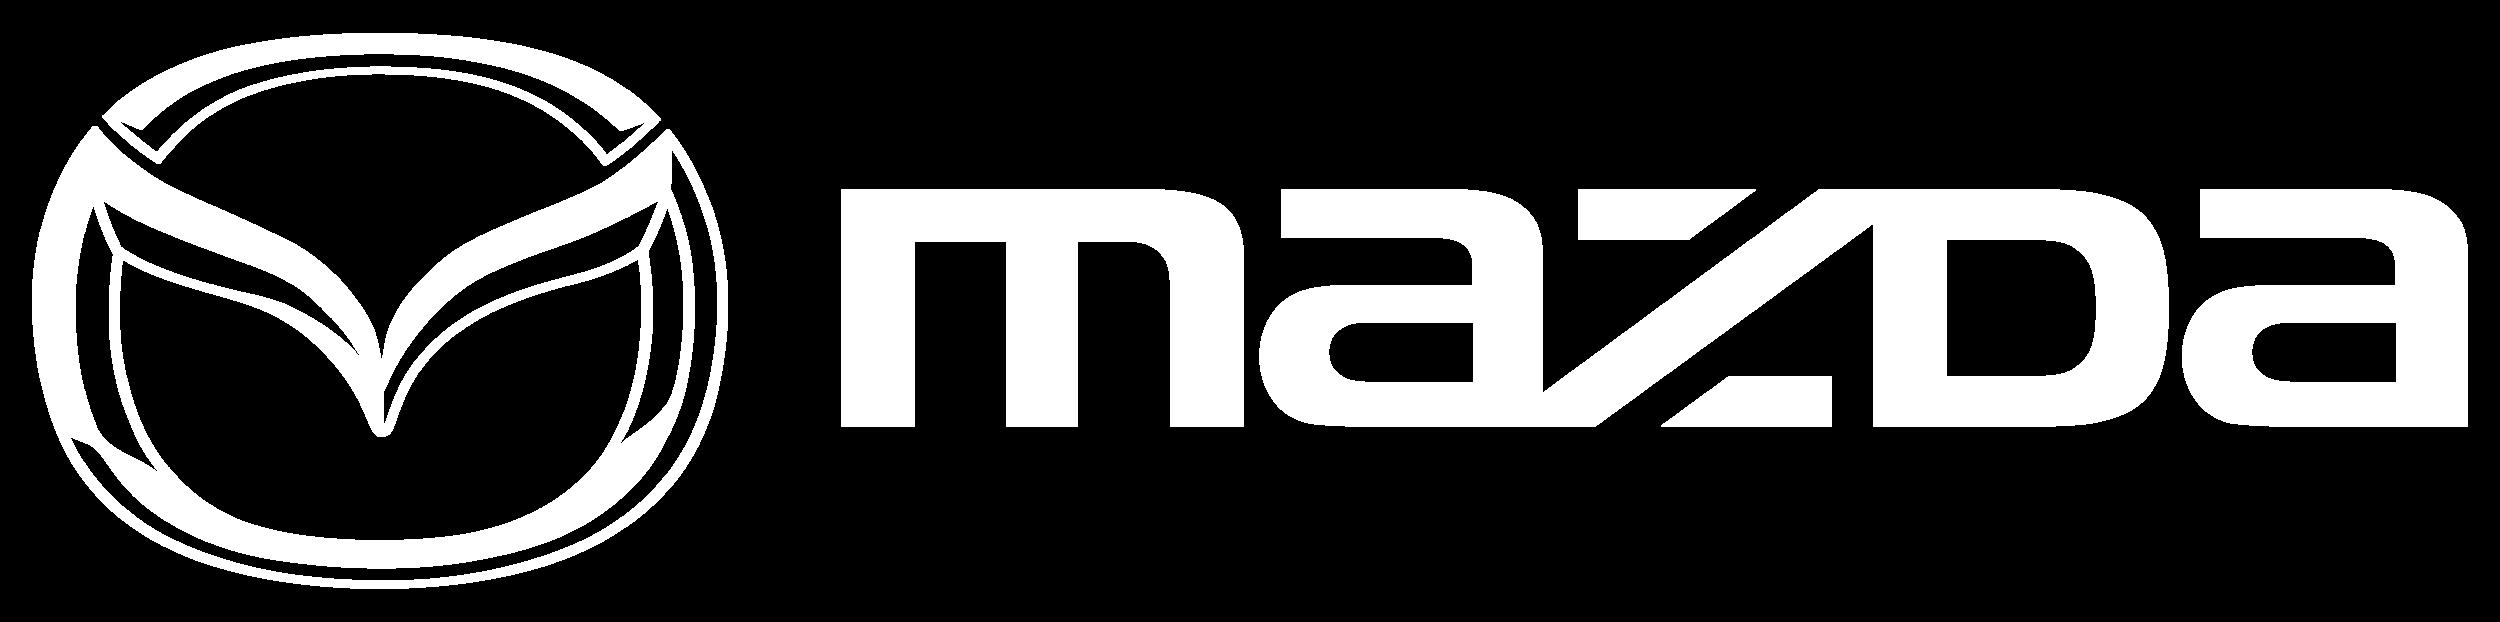 Logo_Solid_White_Horizontal.png